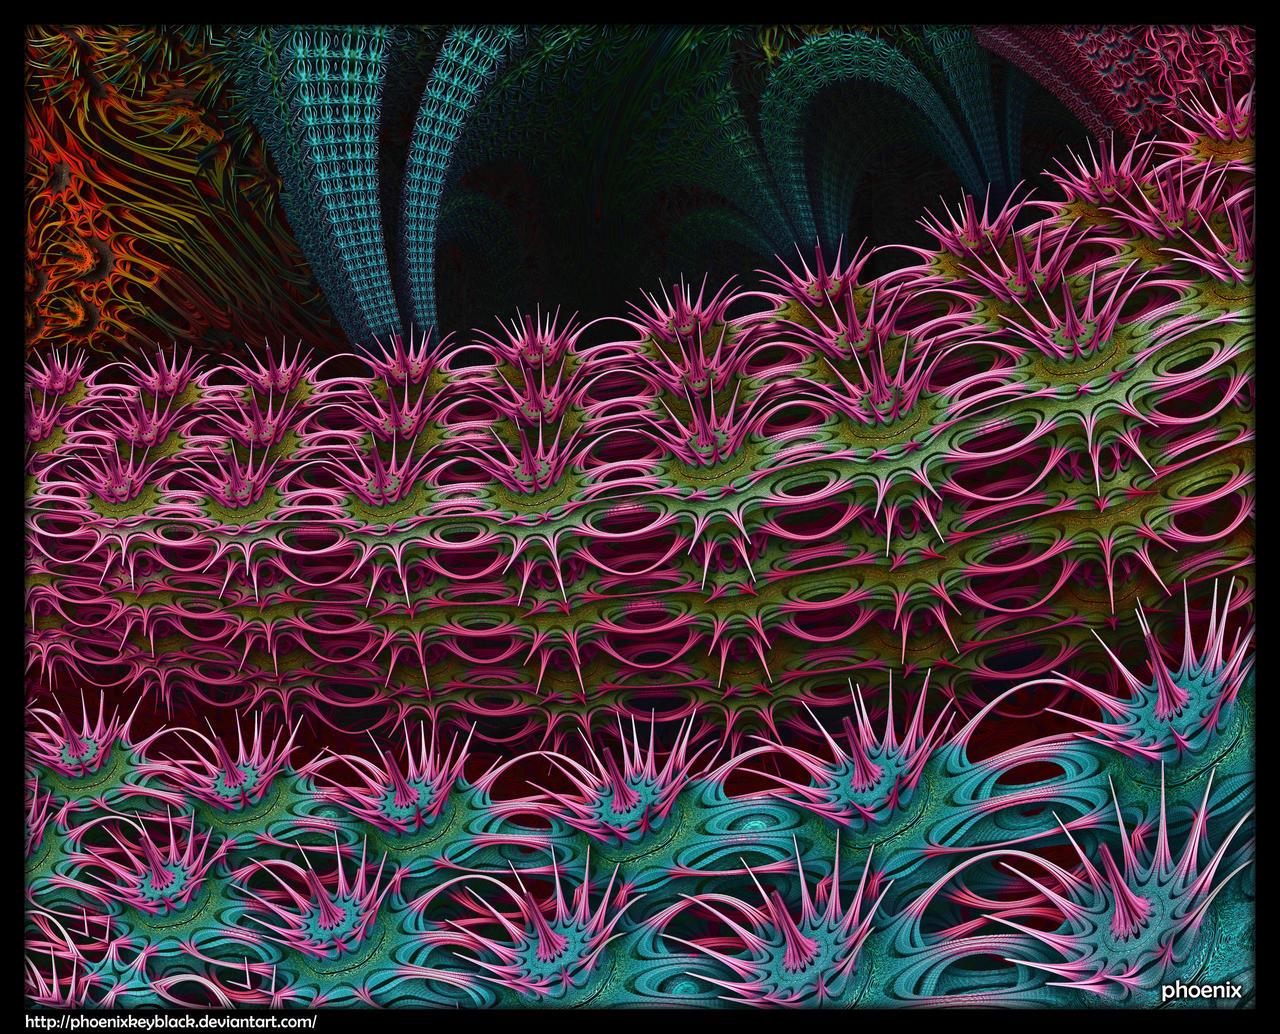 Thorny Hedges by phoenixkeyblack